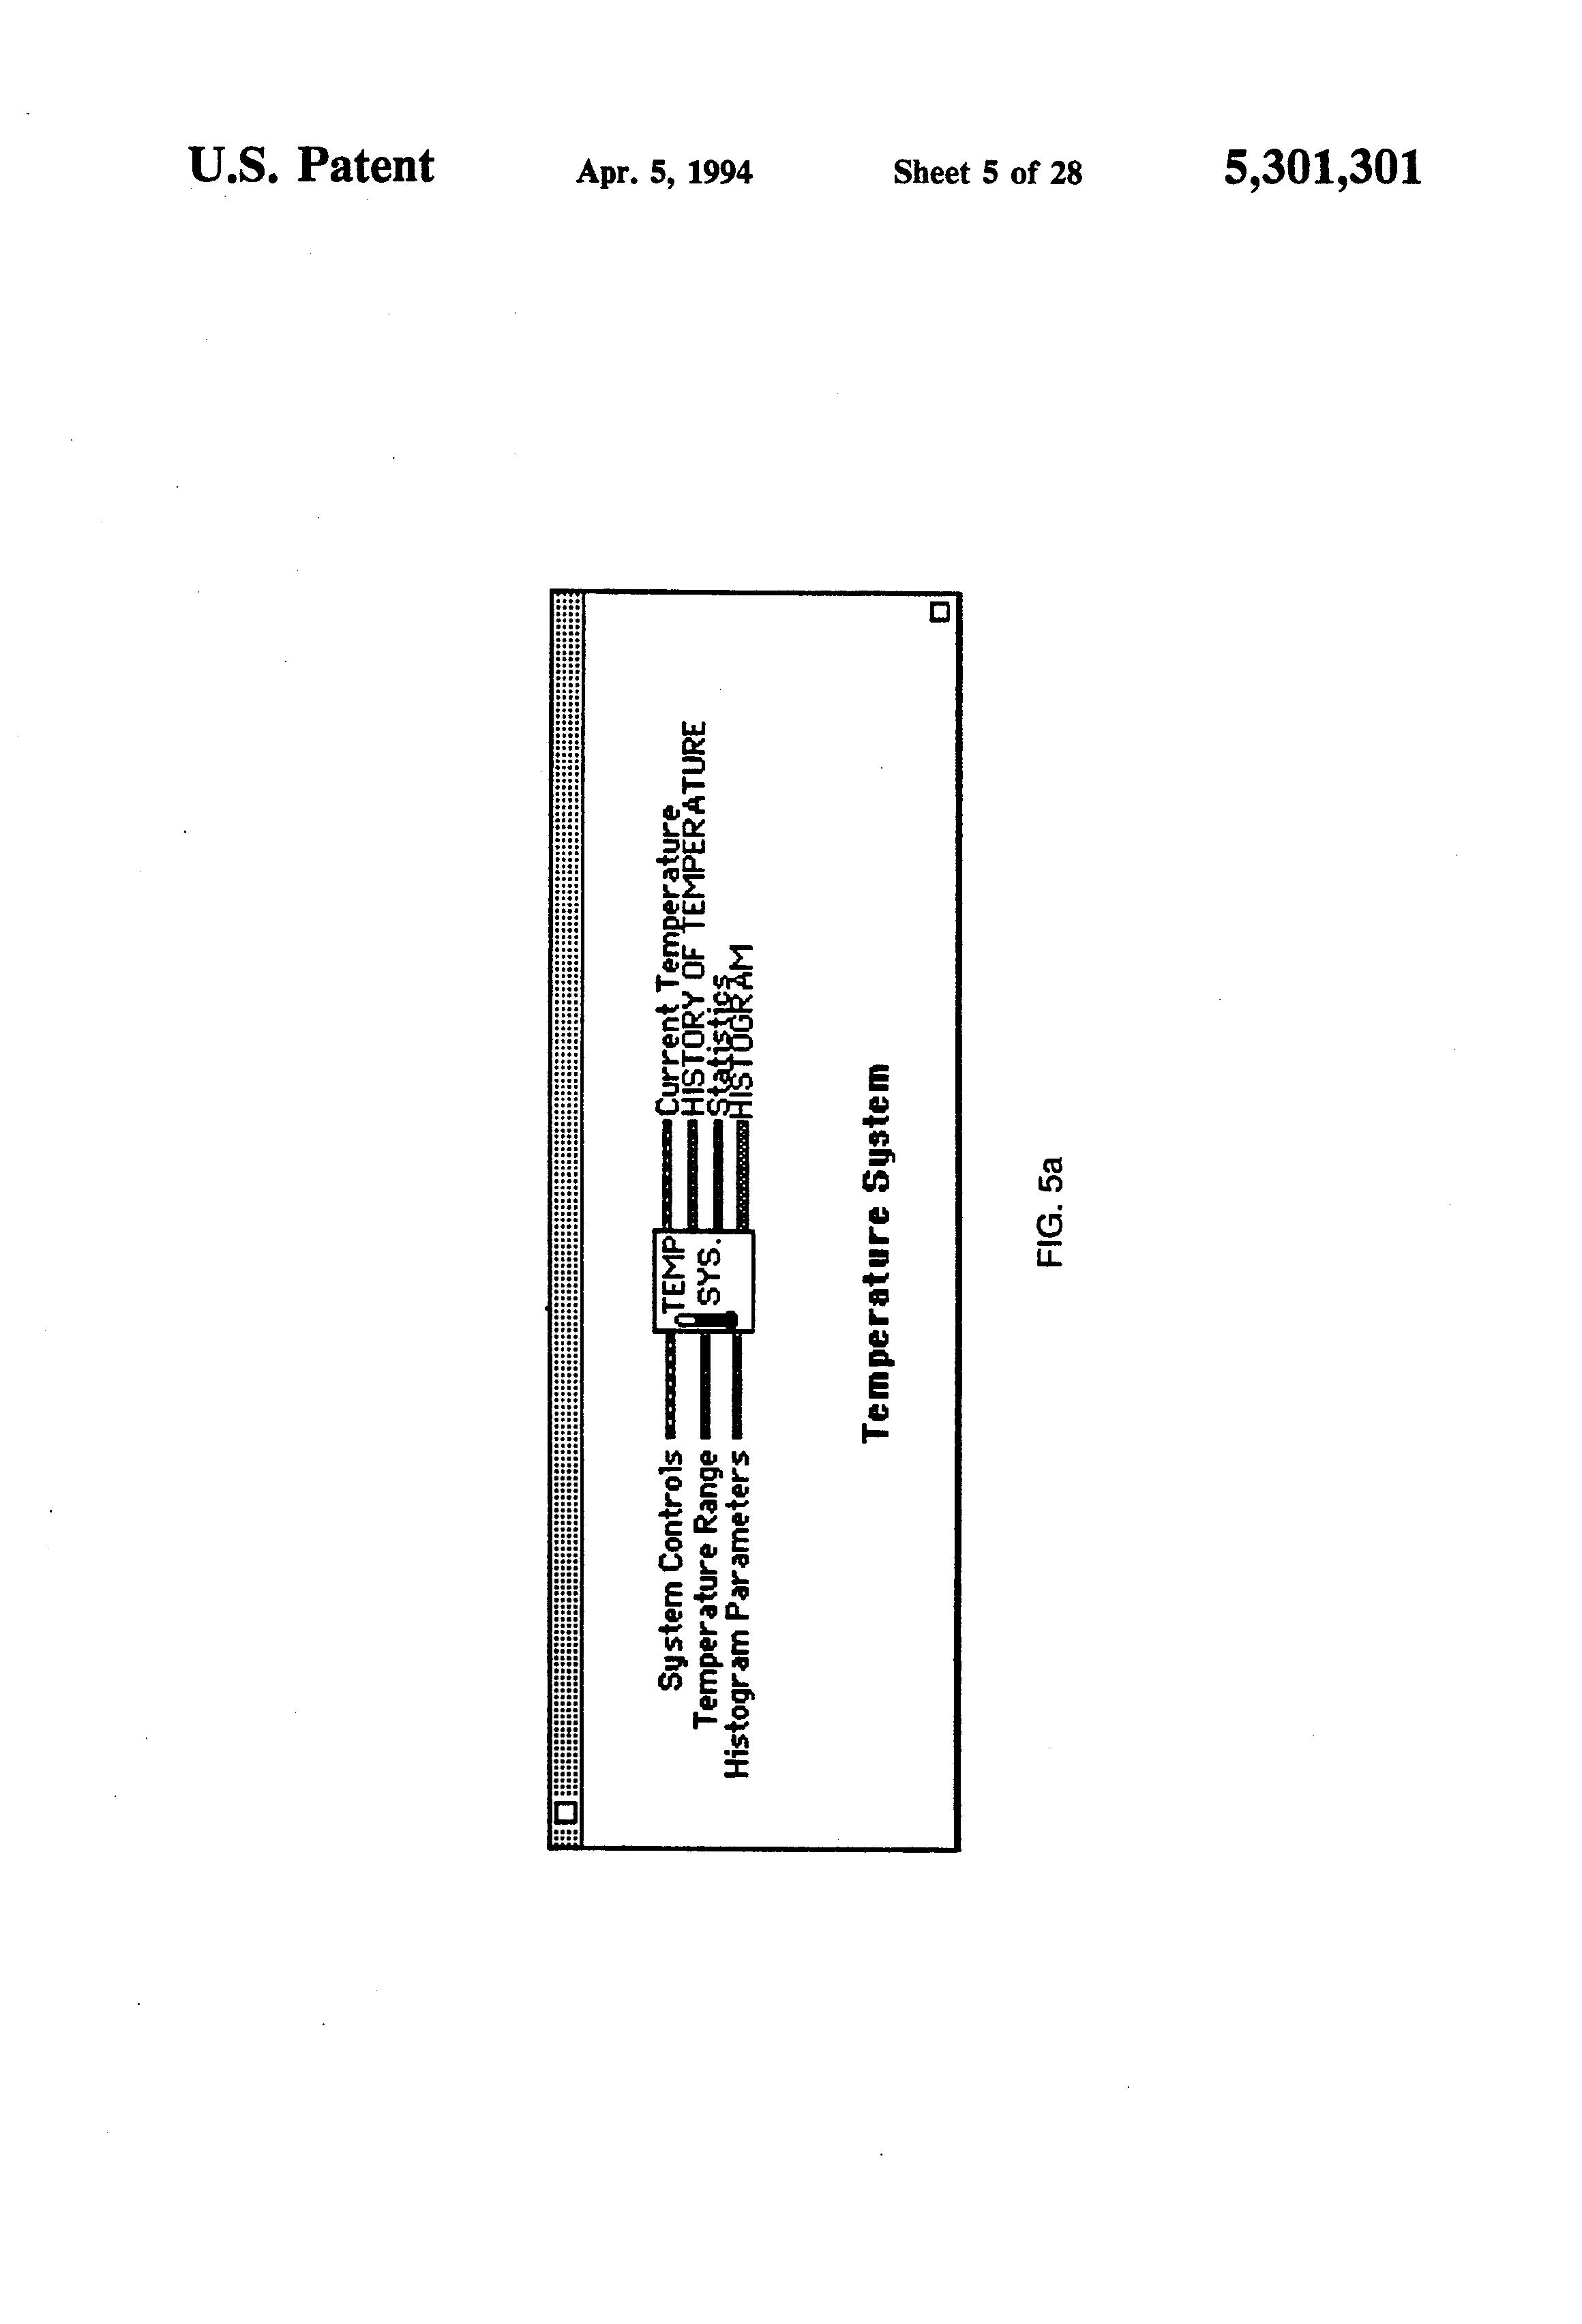 patente us5301301